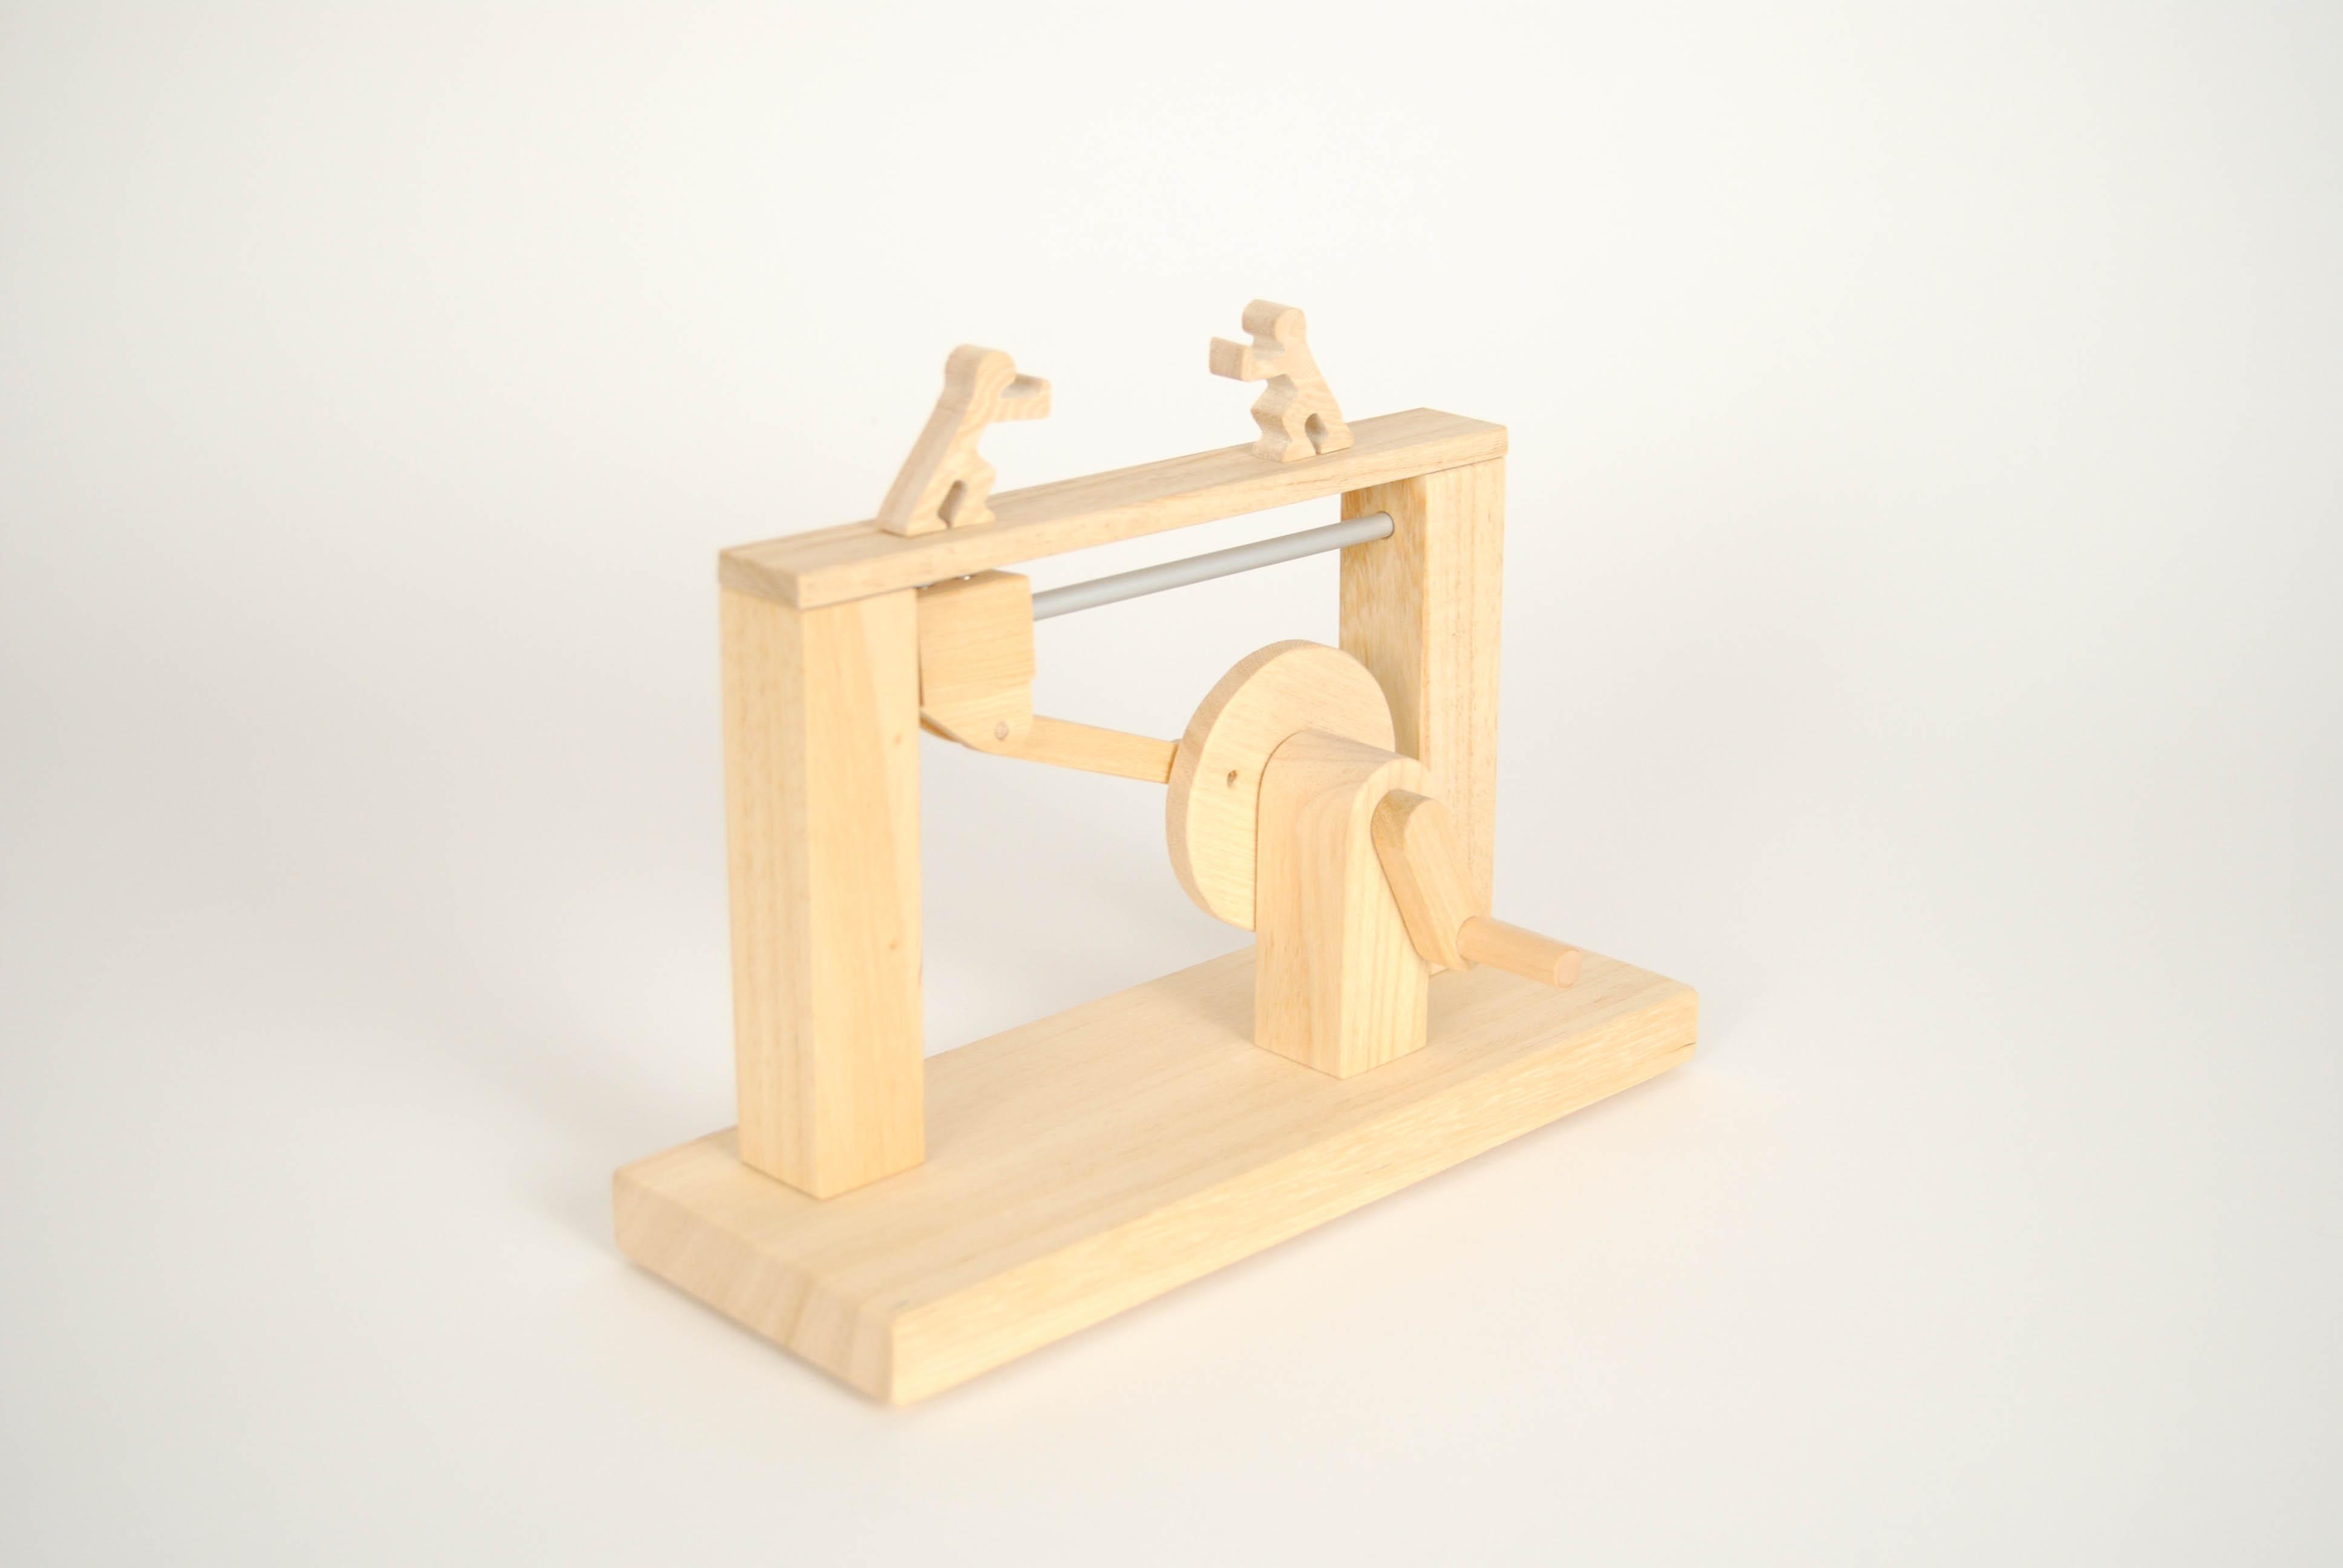 leonardo da vinci magnetic wooden toy with people shove